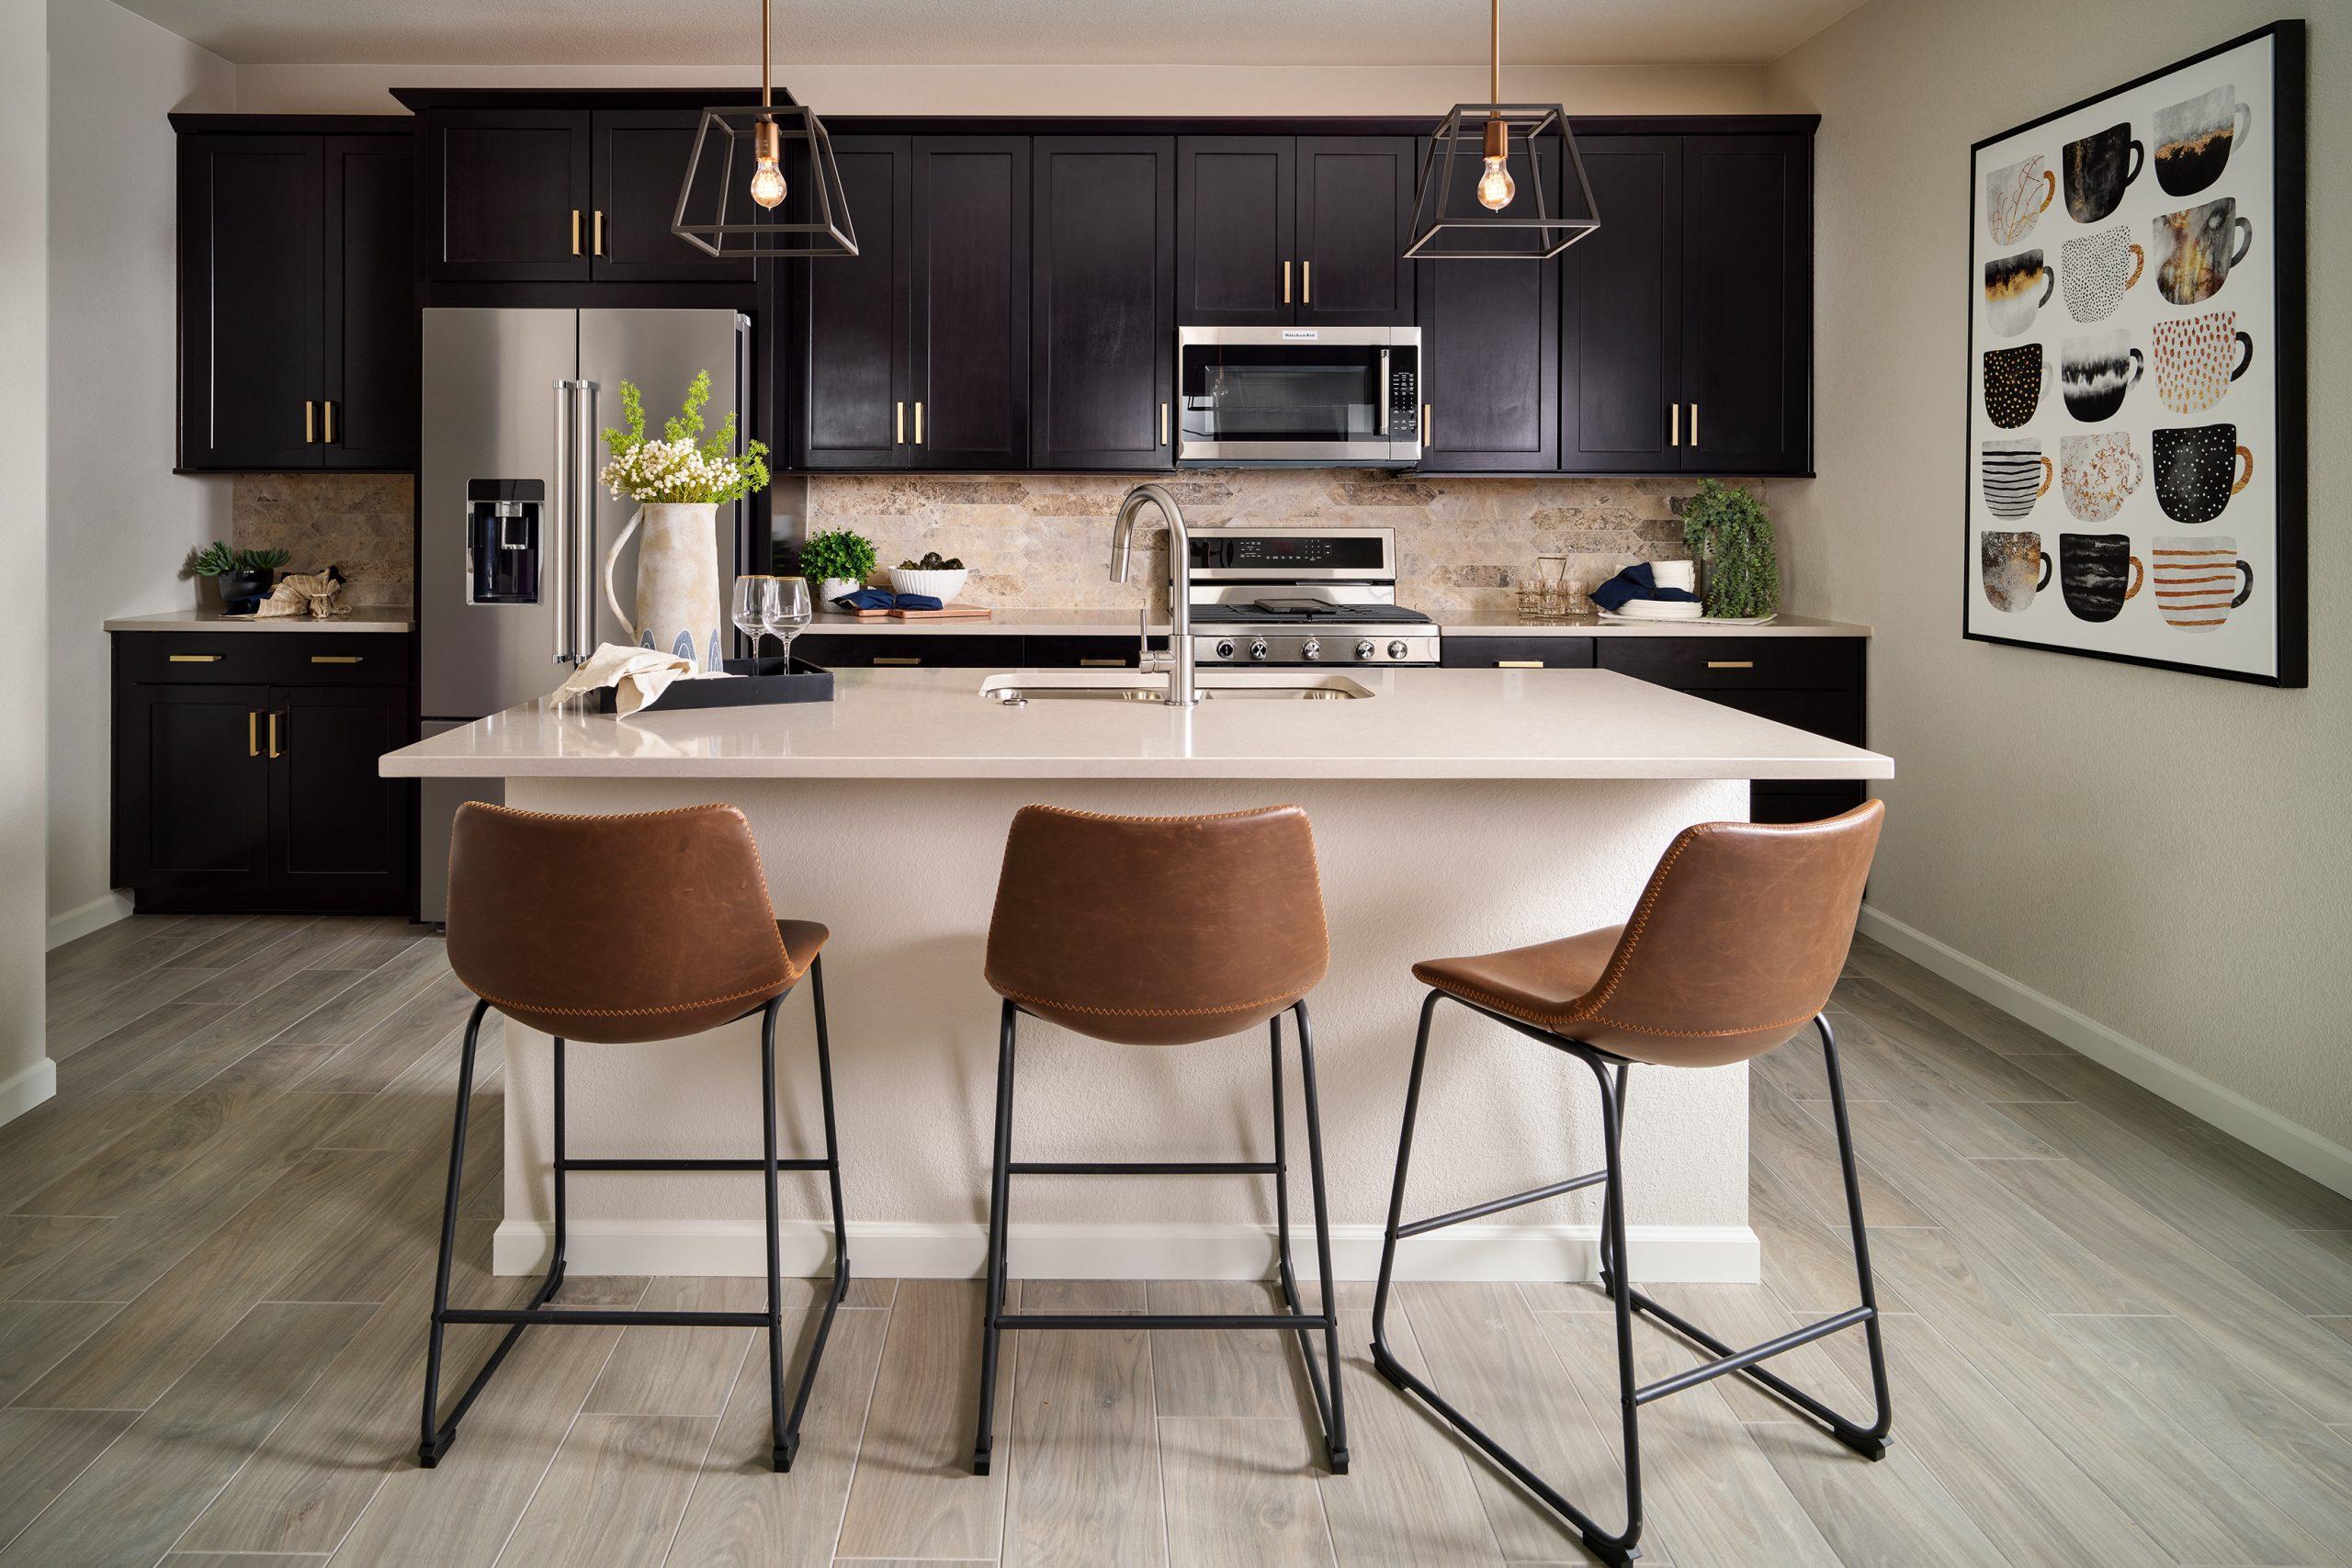 Single family colorado architect award winning kitchen design